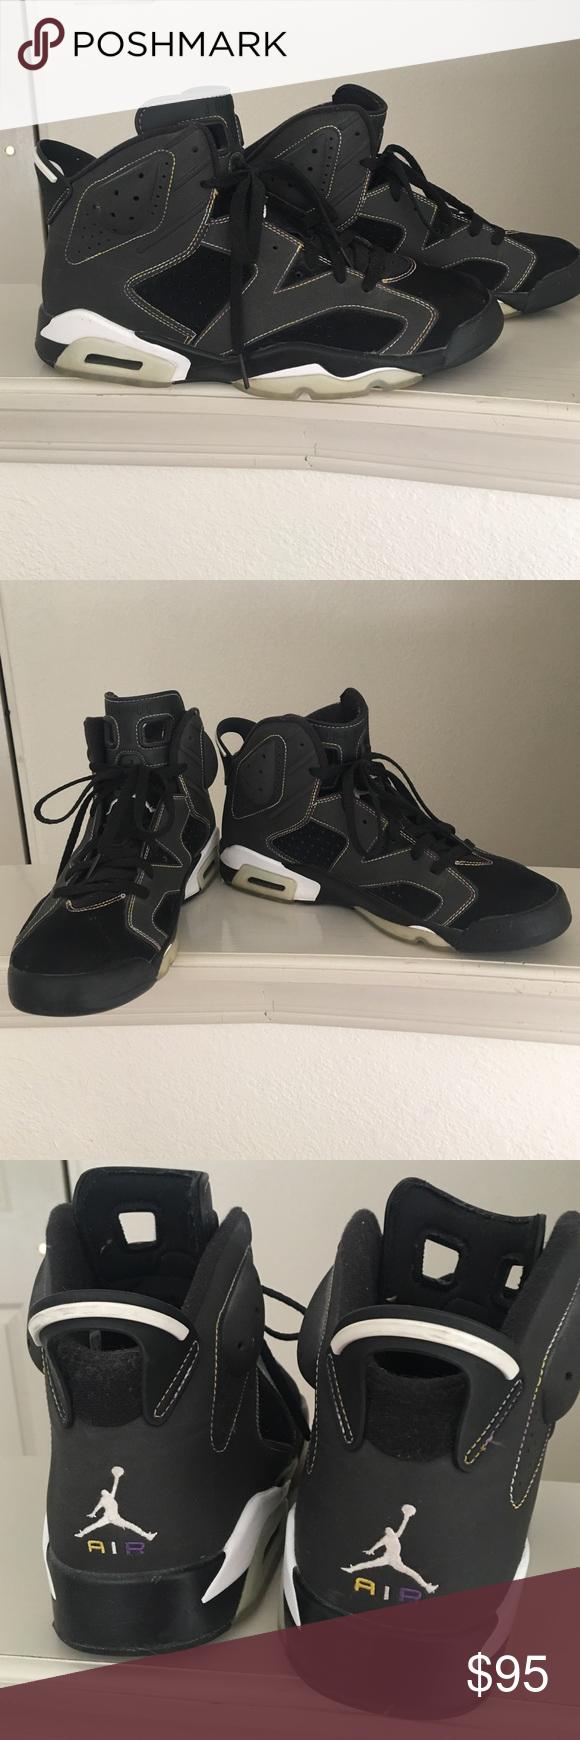 Retro 6 black laker edition Men's Laker edition retro 6 Nike air Jordan's.  Excellent condition Nike Shoes Sneakers